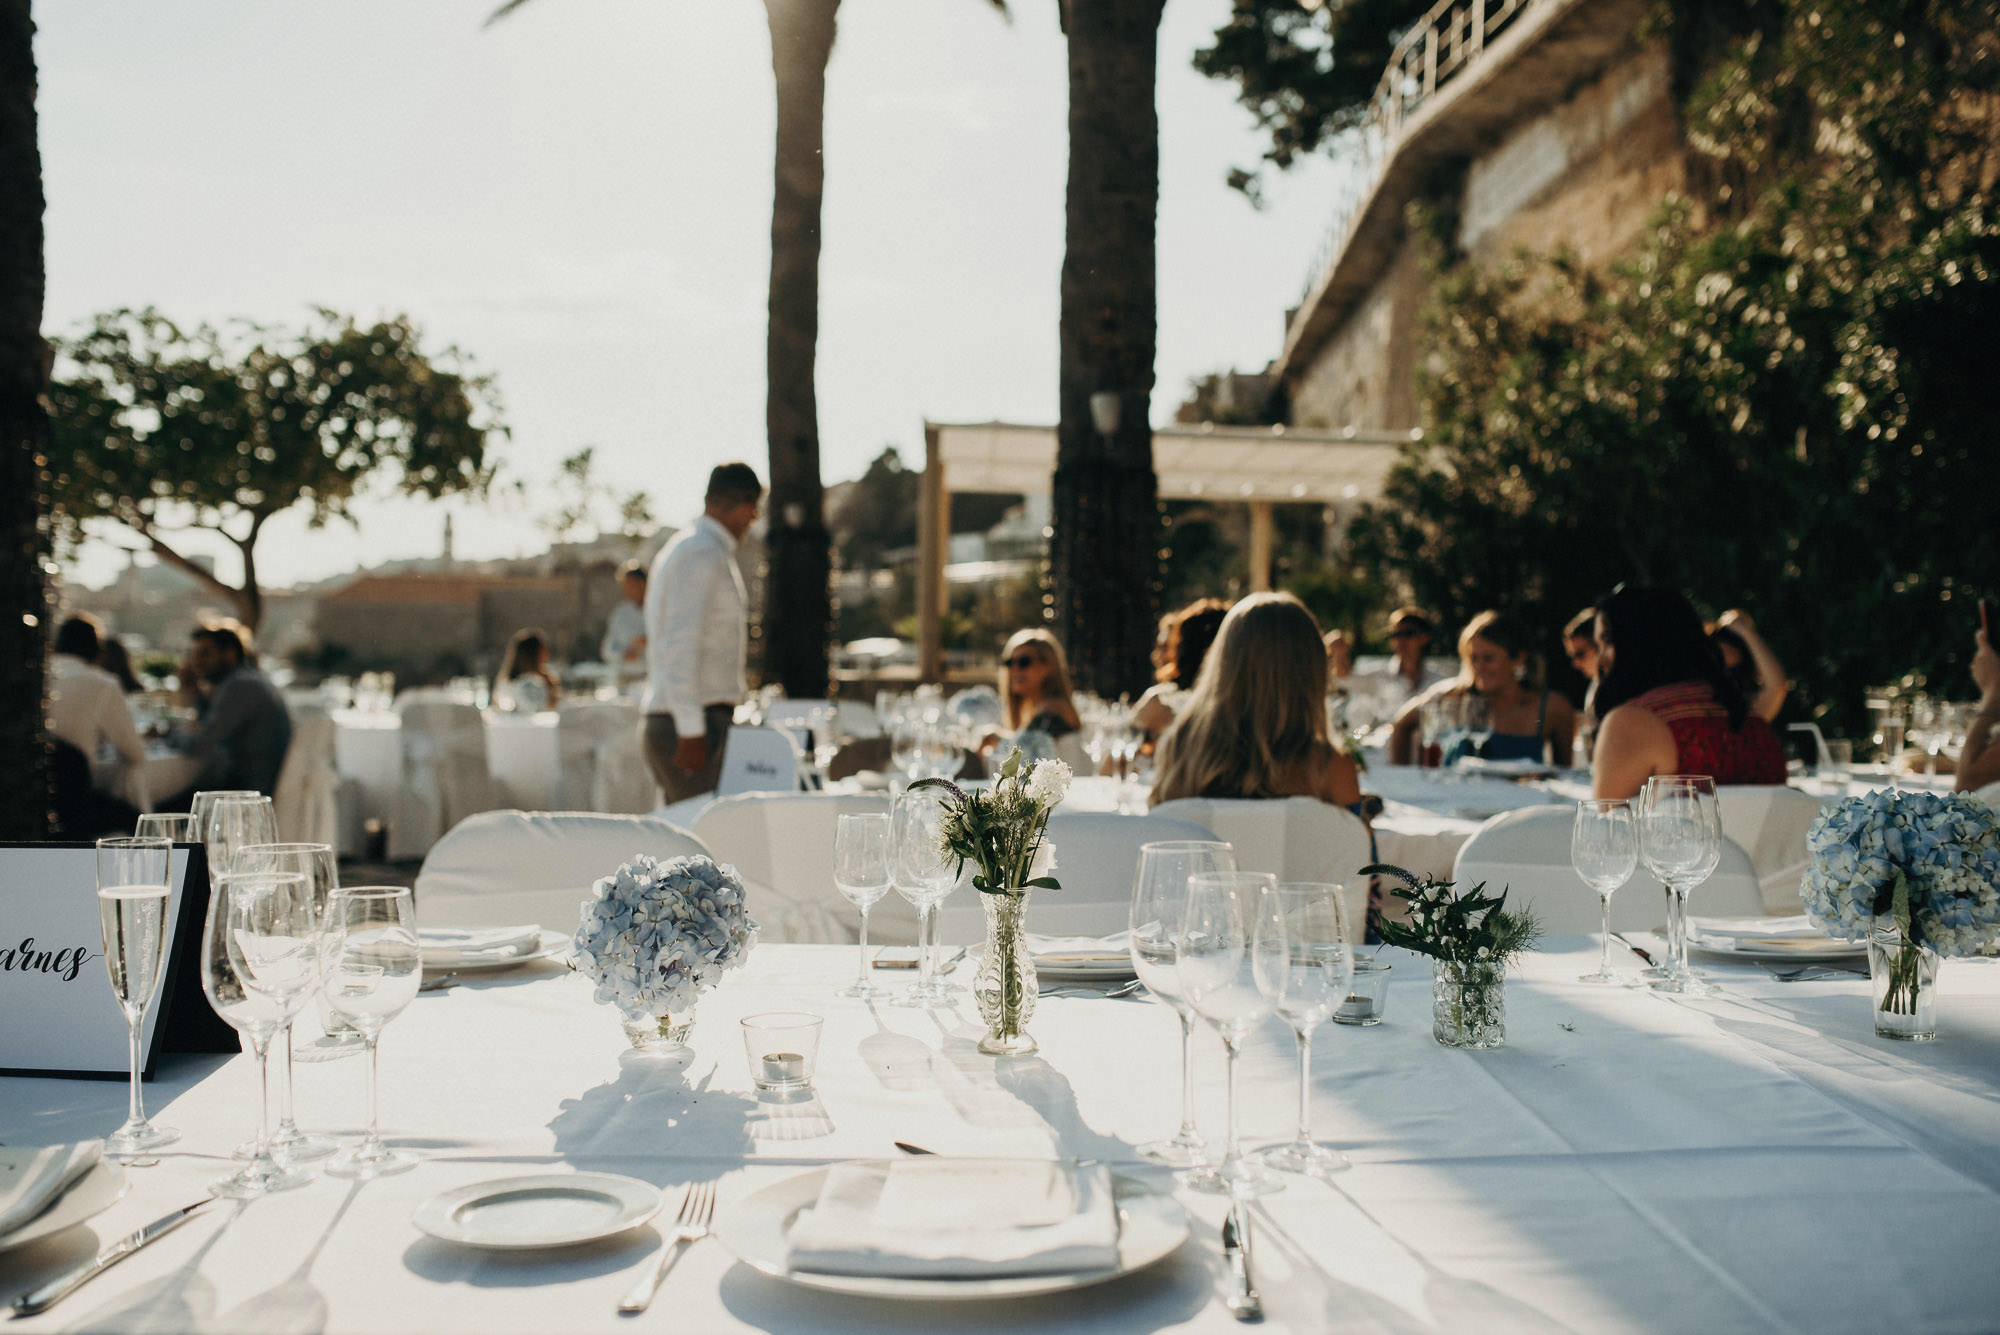 dubrovnik_croatia_wedding_photographer-jere_satamo-destination_weddings-053-web.jpg